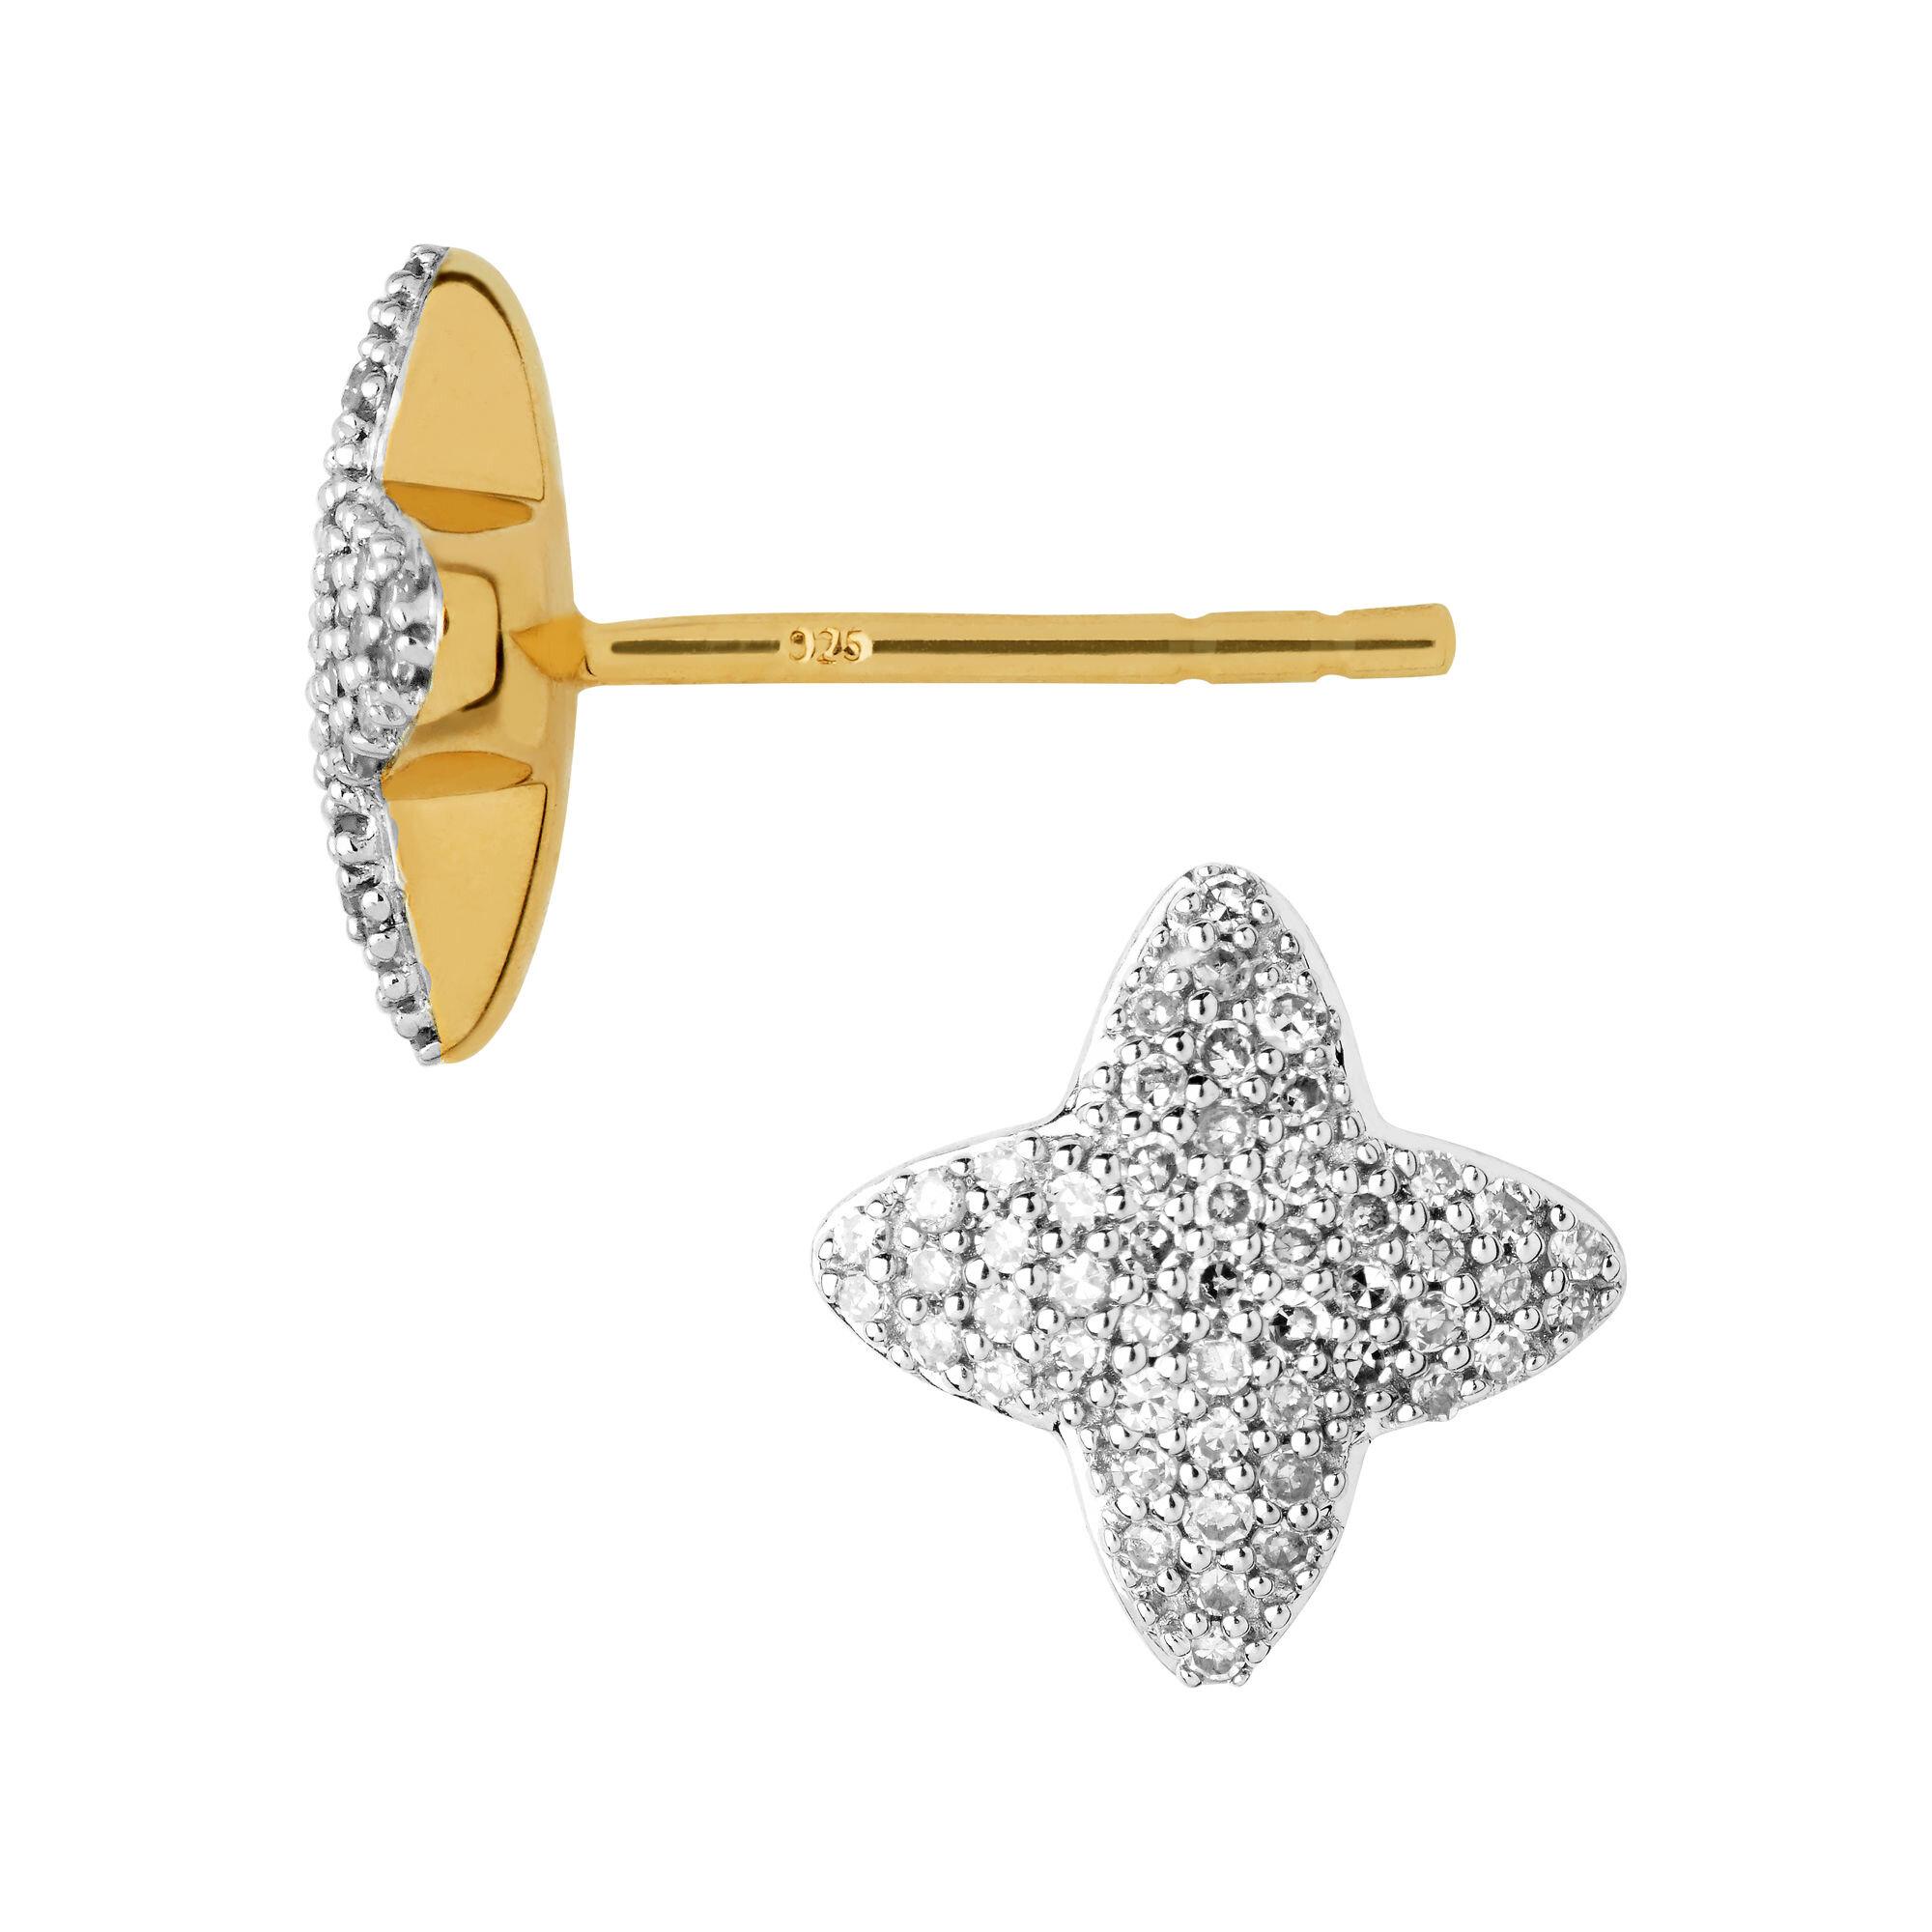 Links-of-London_Splendour_Jewellery_5040.3086_1.jpg